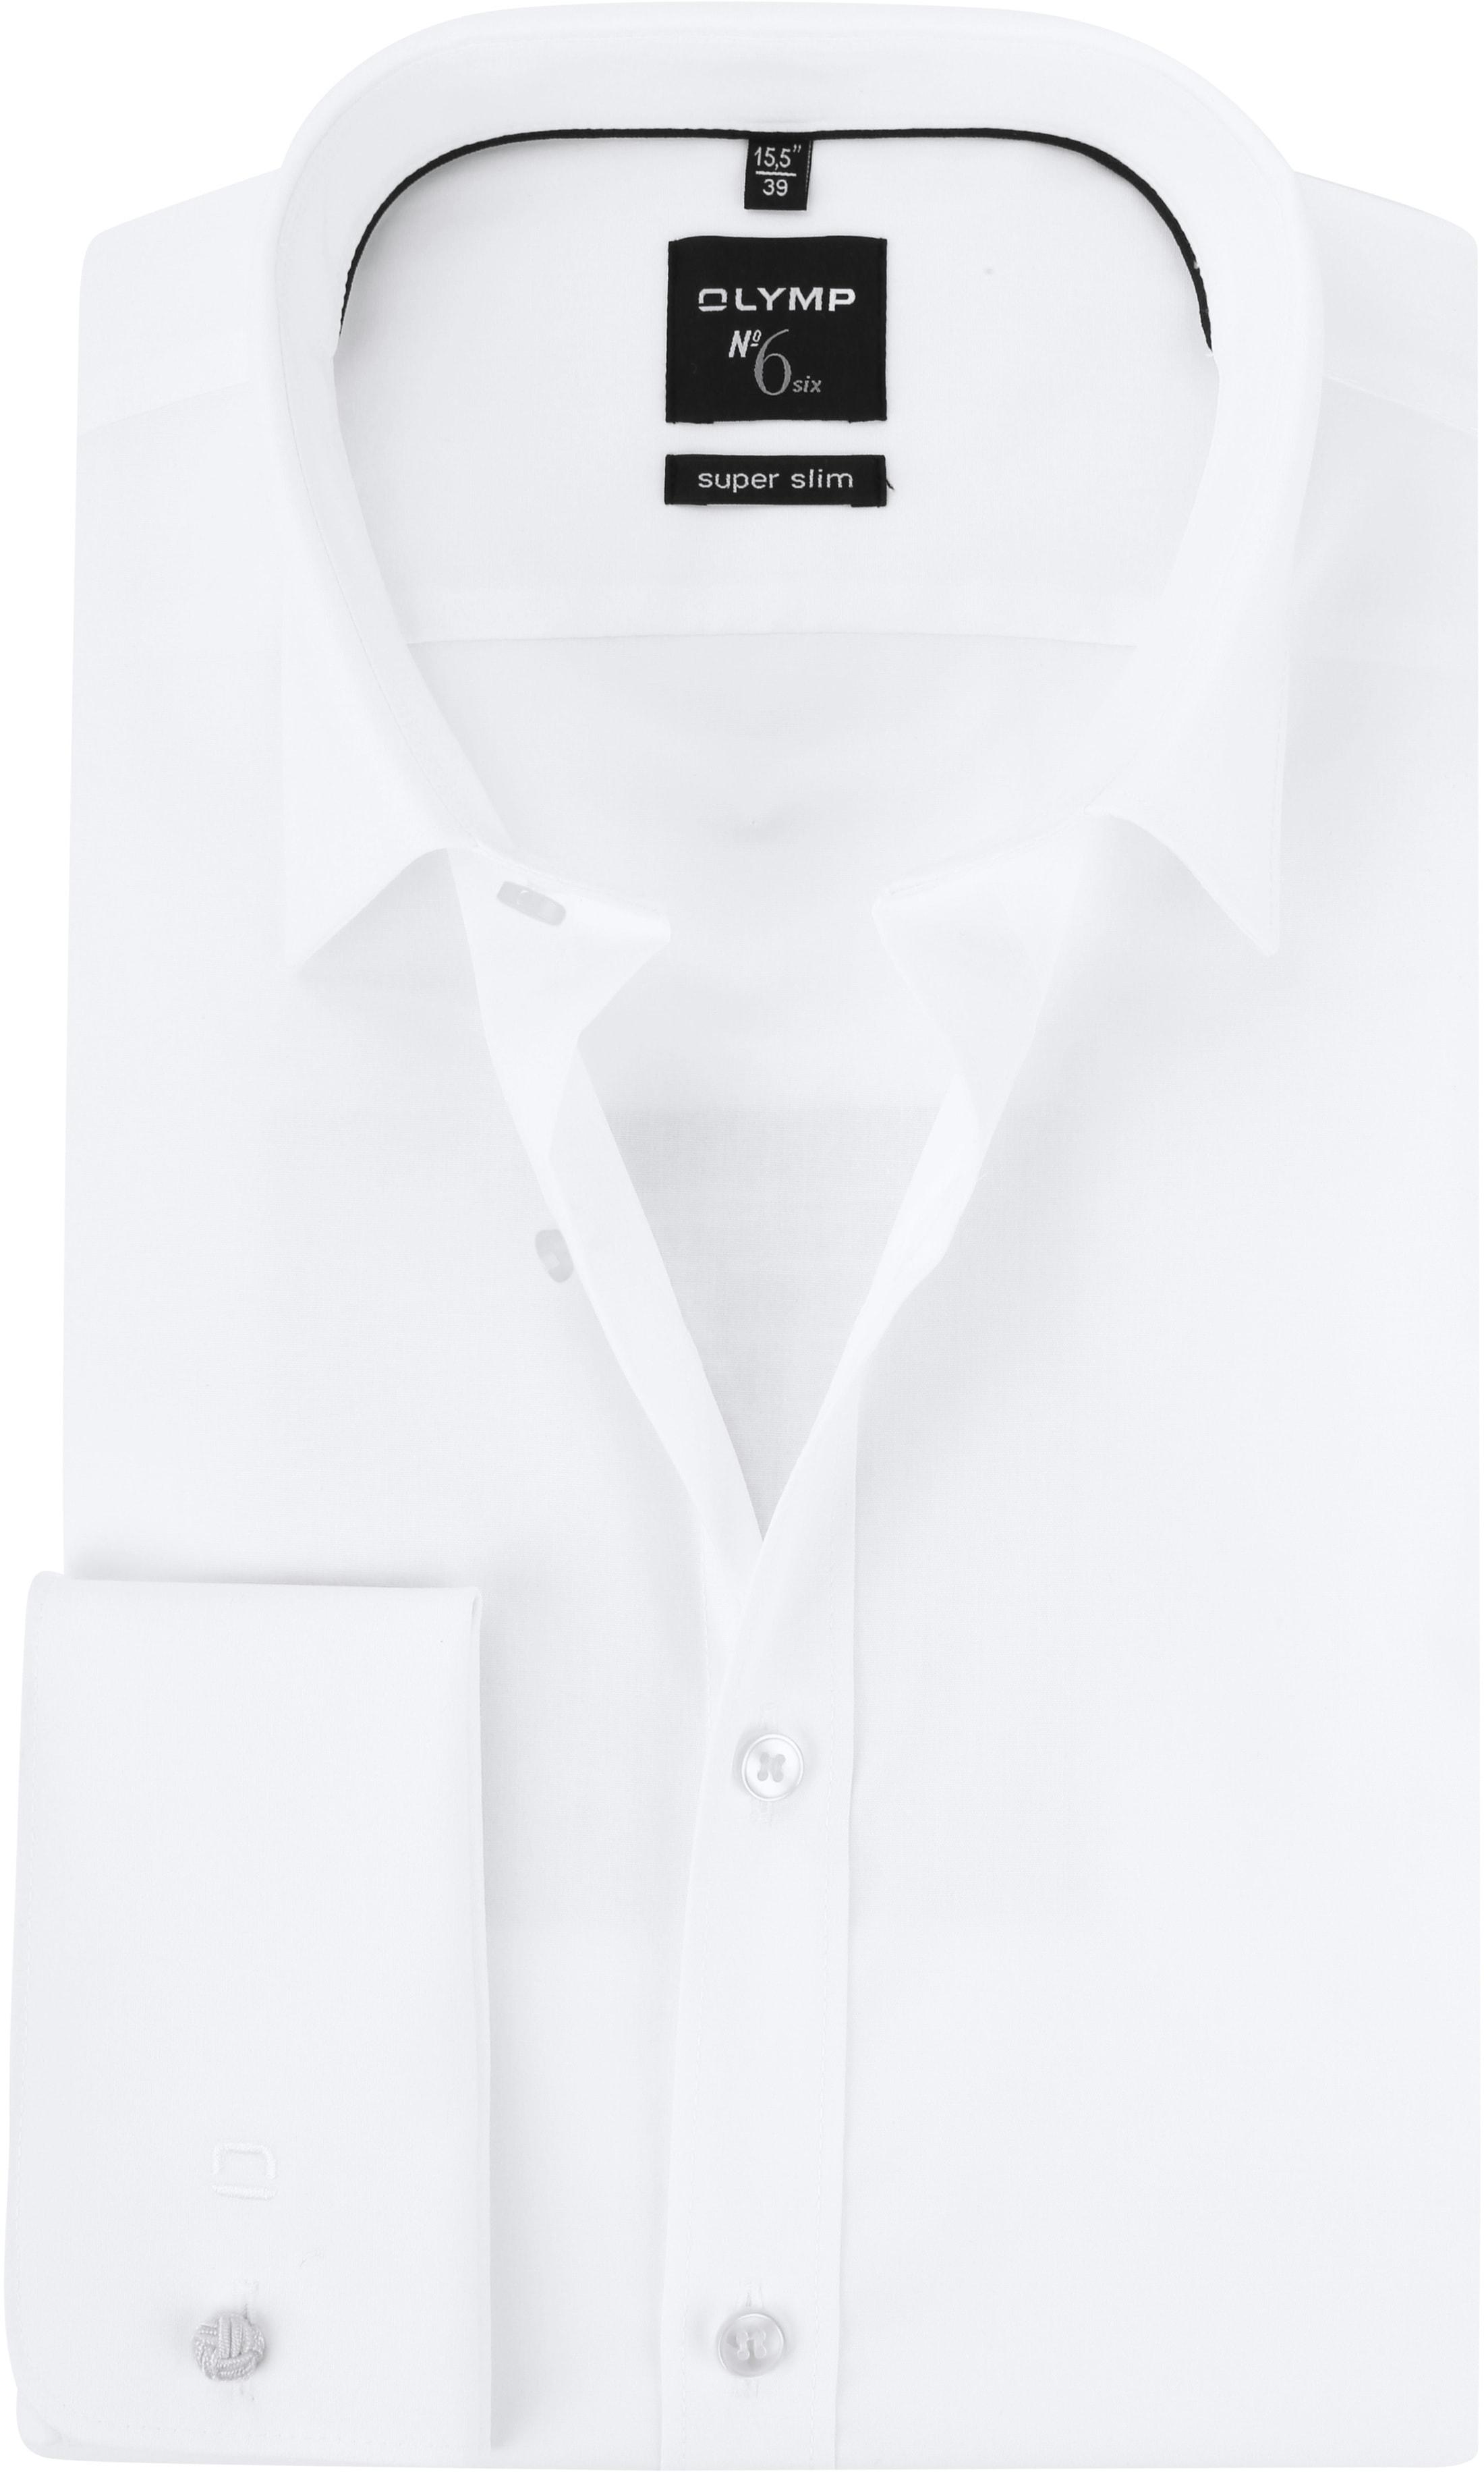 OLYMP No'6 six Hemd Super Slim Fit Schwarz 046664 online